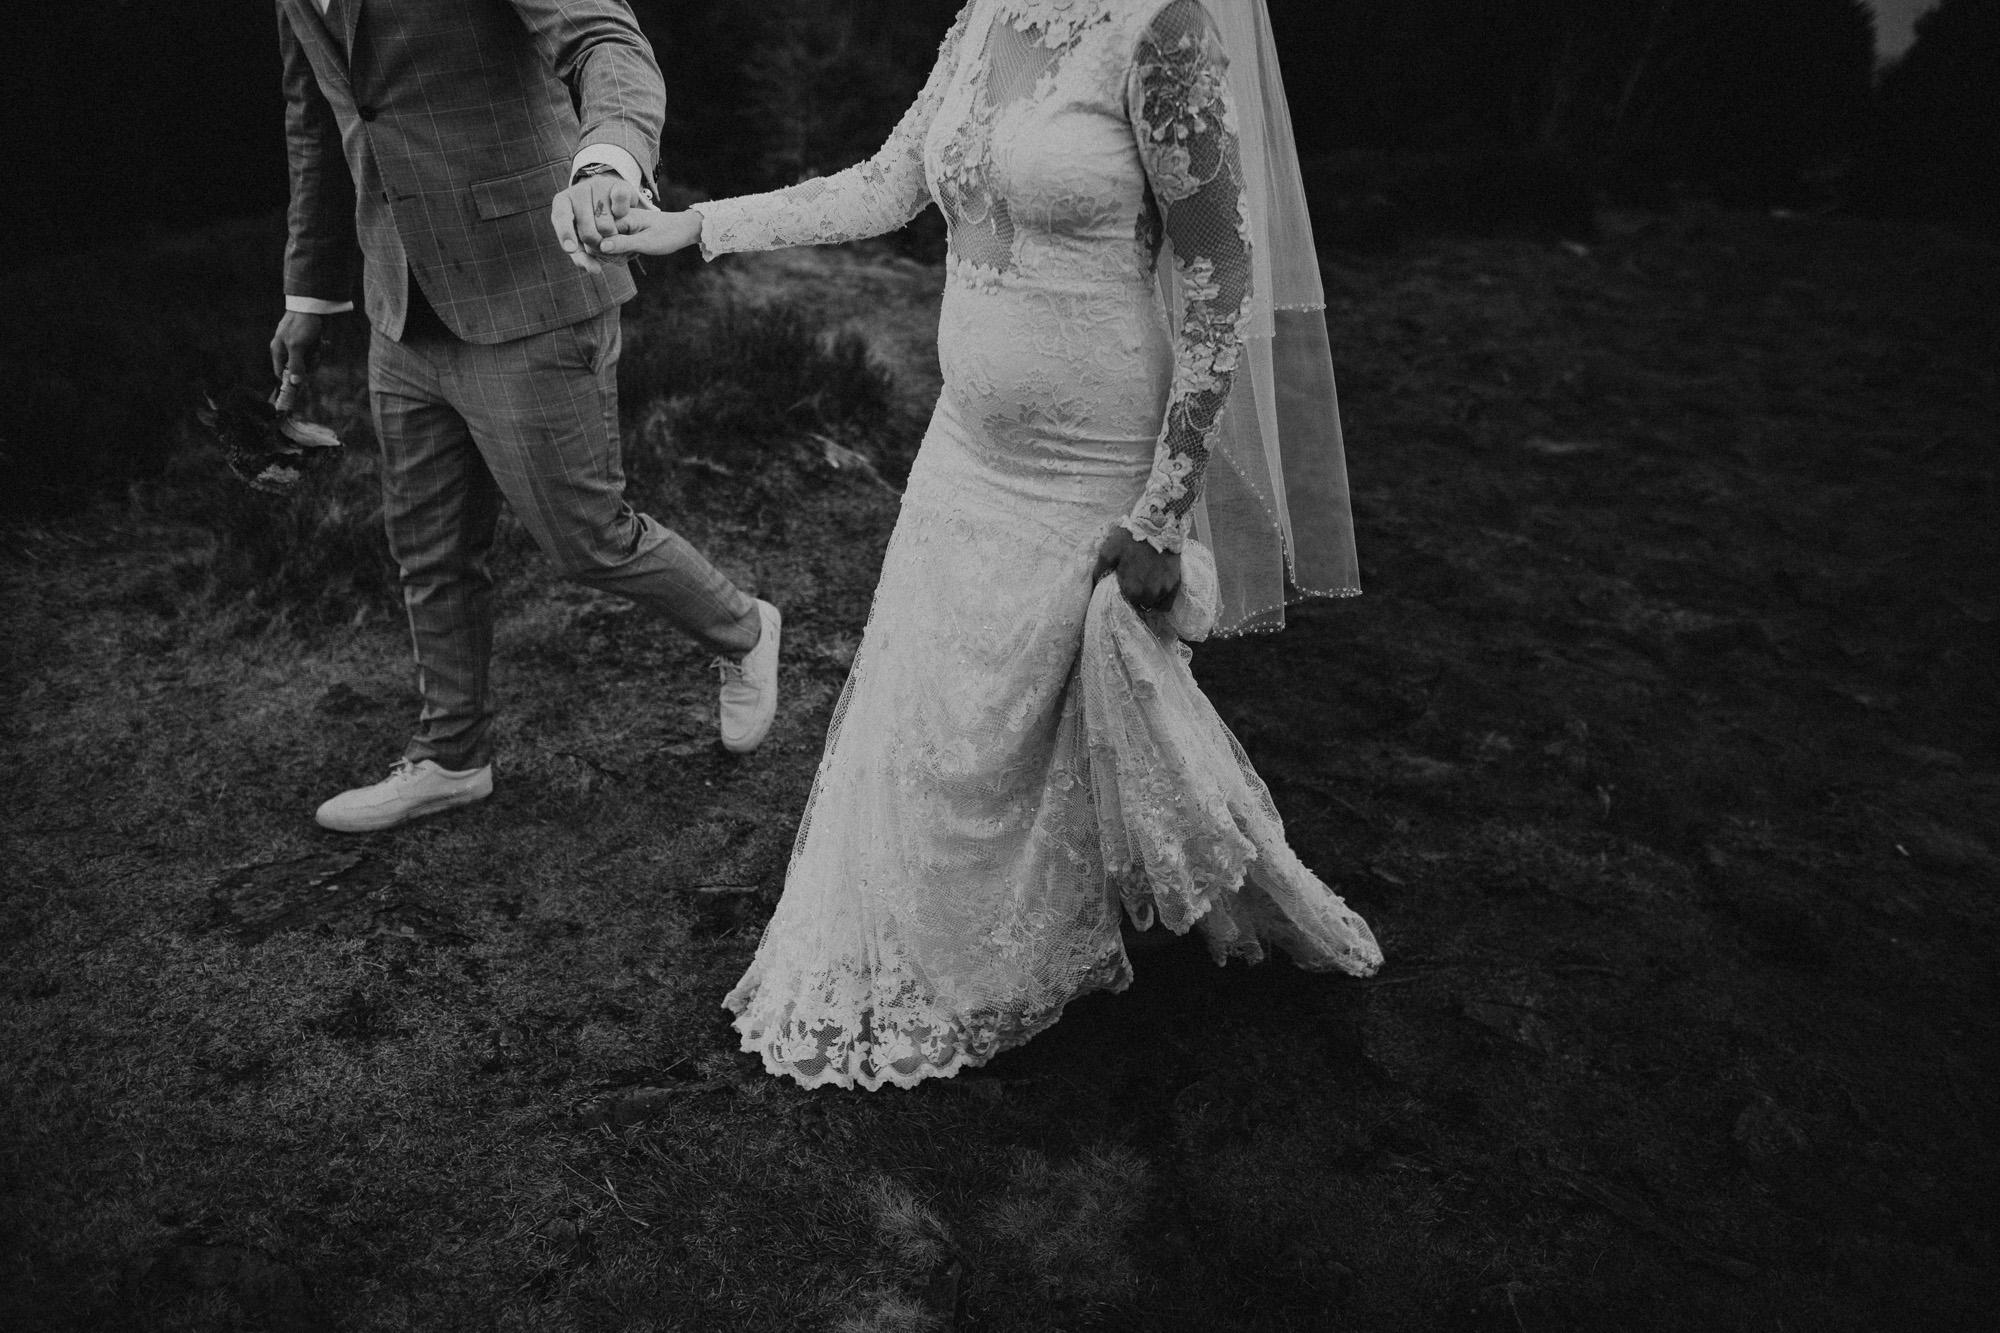 DanielaMarquardtPhotography_Hochzeitsfotograf_Düsseldorf_Köln_Mallorca_Bayern_Austria_Harz_LinaundMaik_Afterwedding-Shooting_Weddingphotographer_Ibiza_Tuskany_Italien_Toskana66